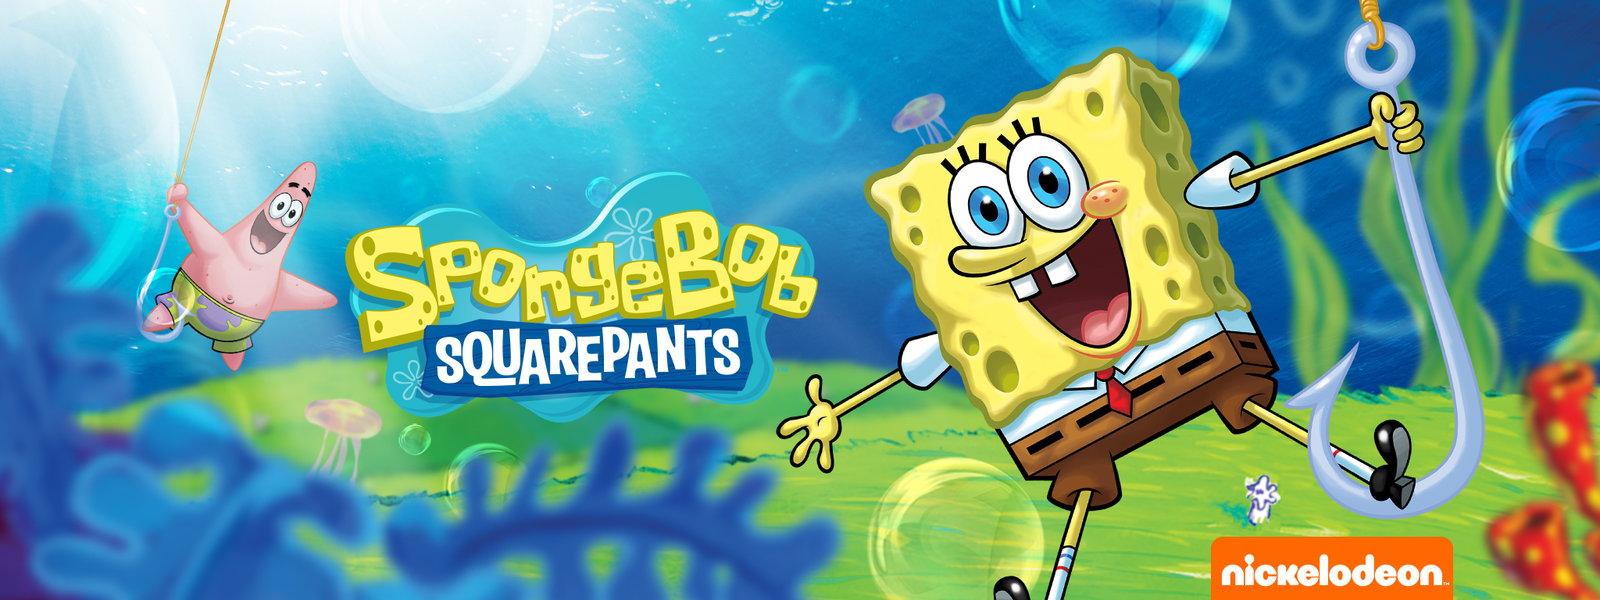 SpongeBob SquarePants | Hulu